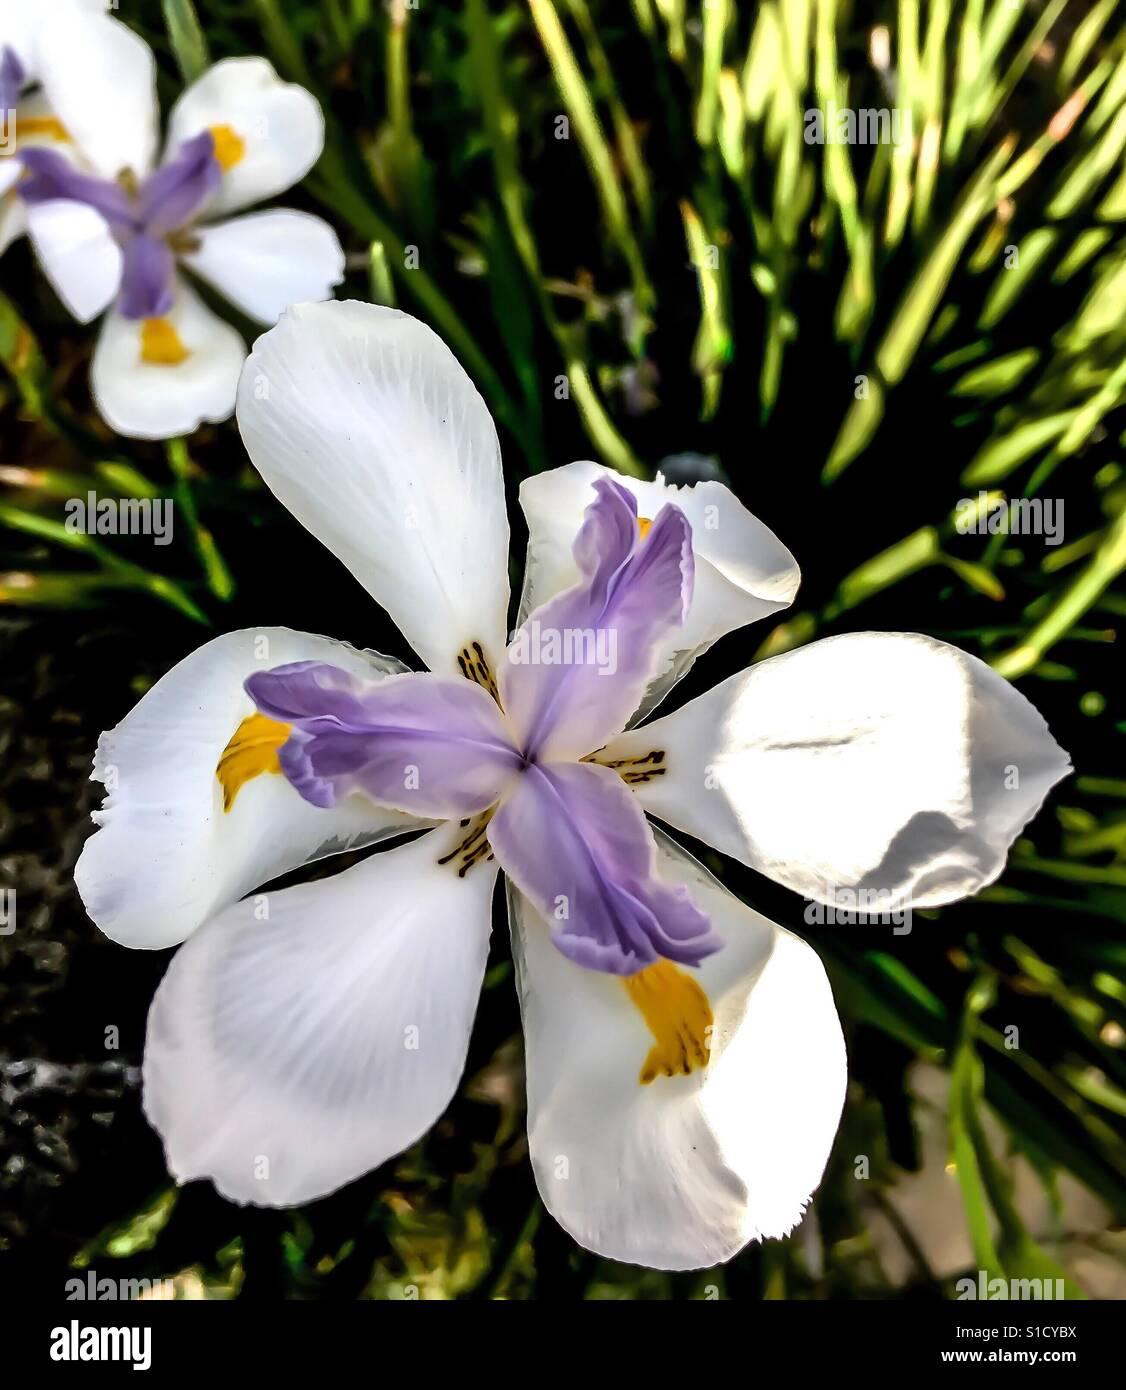 White And Light Purple Iris Flower In Sunlight In Garden Stock Photo